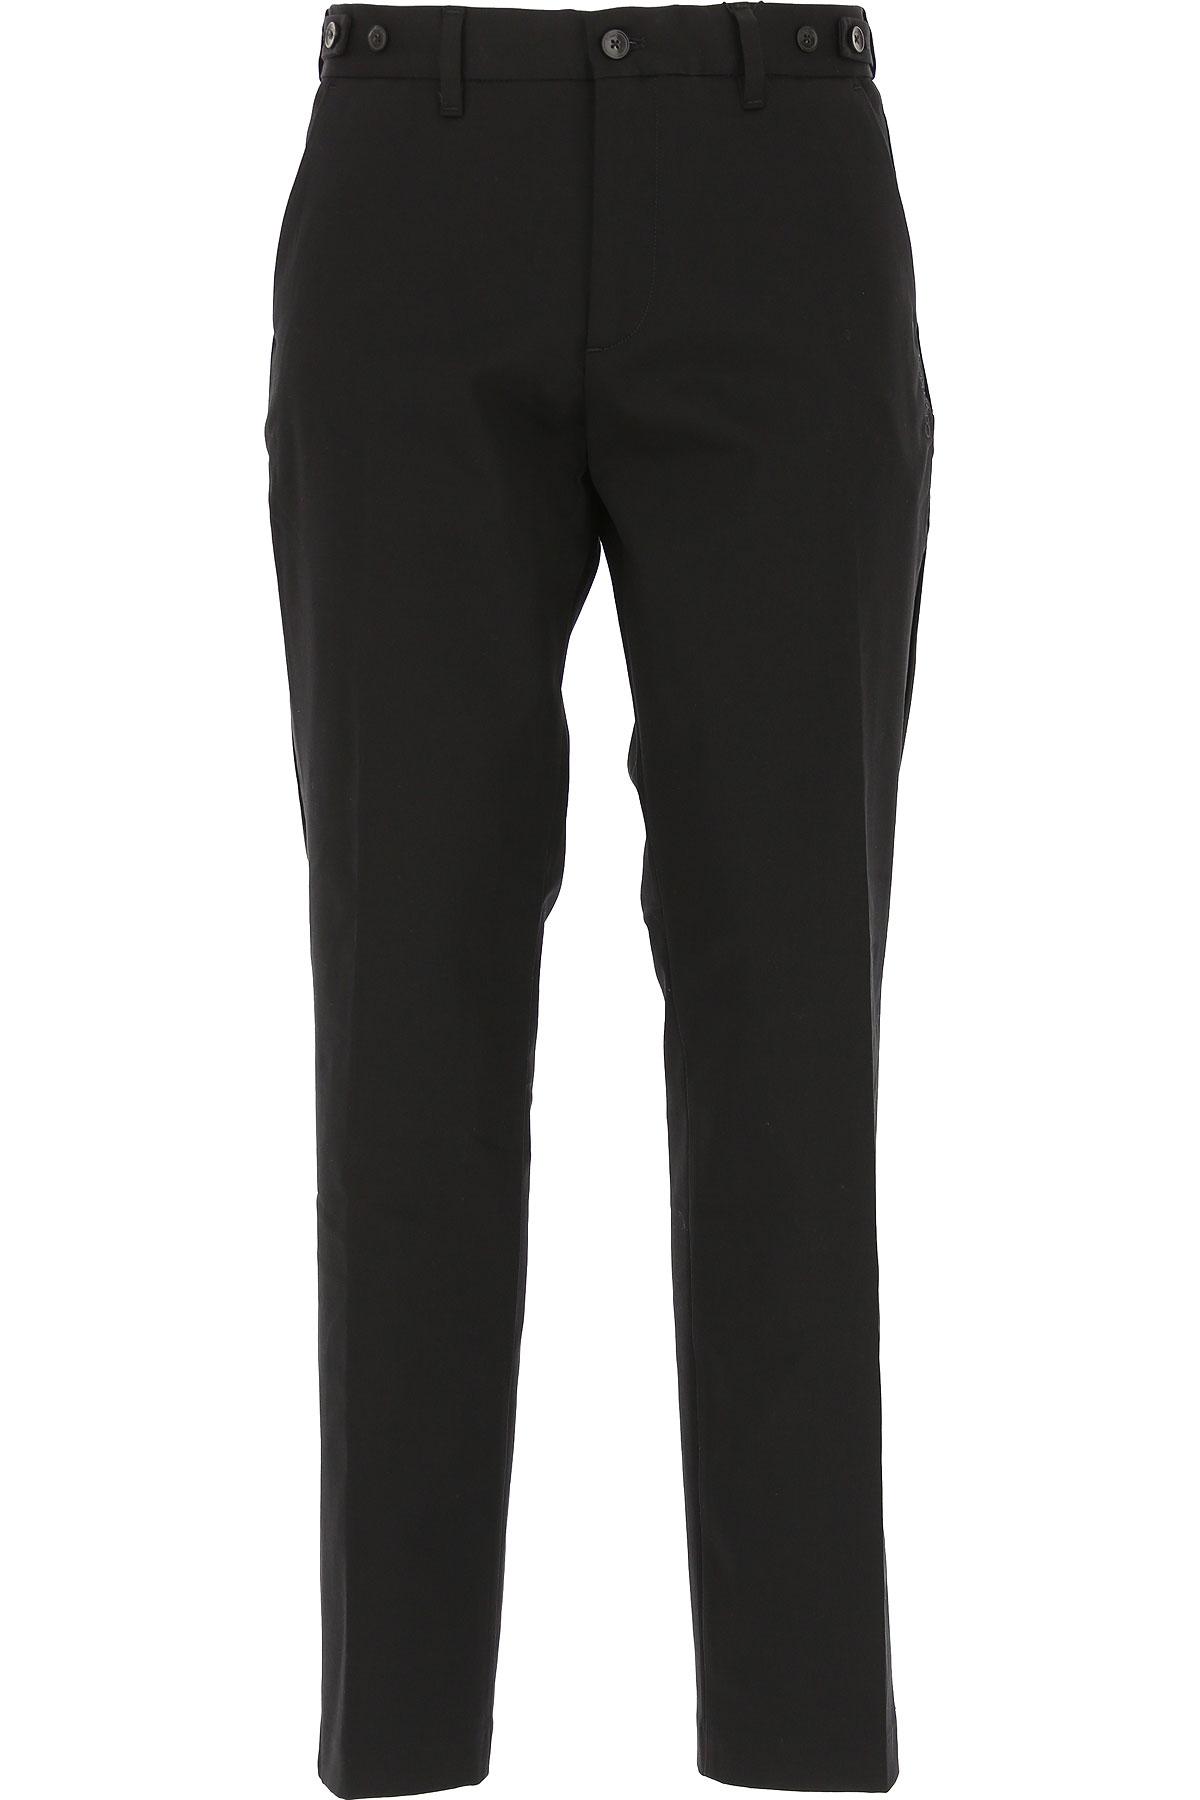 Calvin Klein Pants for Men On Sale in Outlet, Black, Cotton, 2019, 30 36